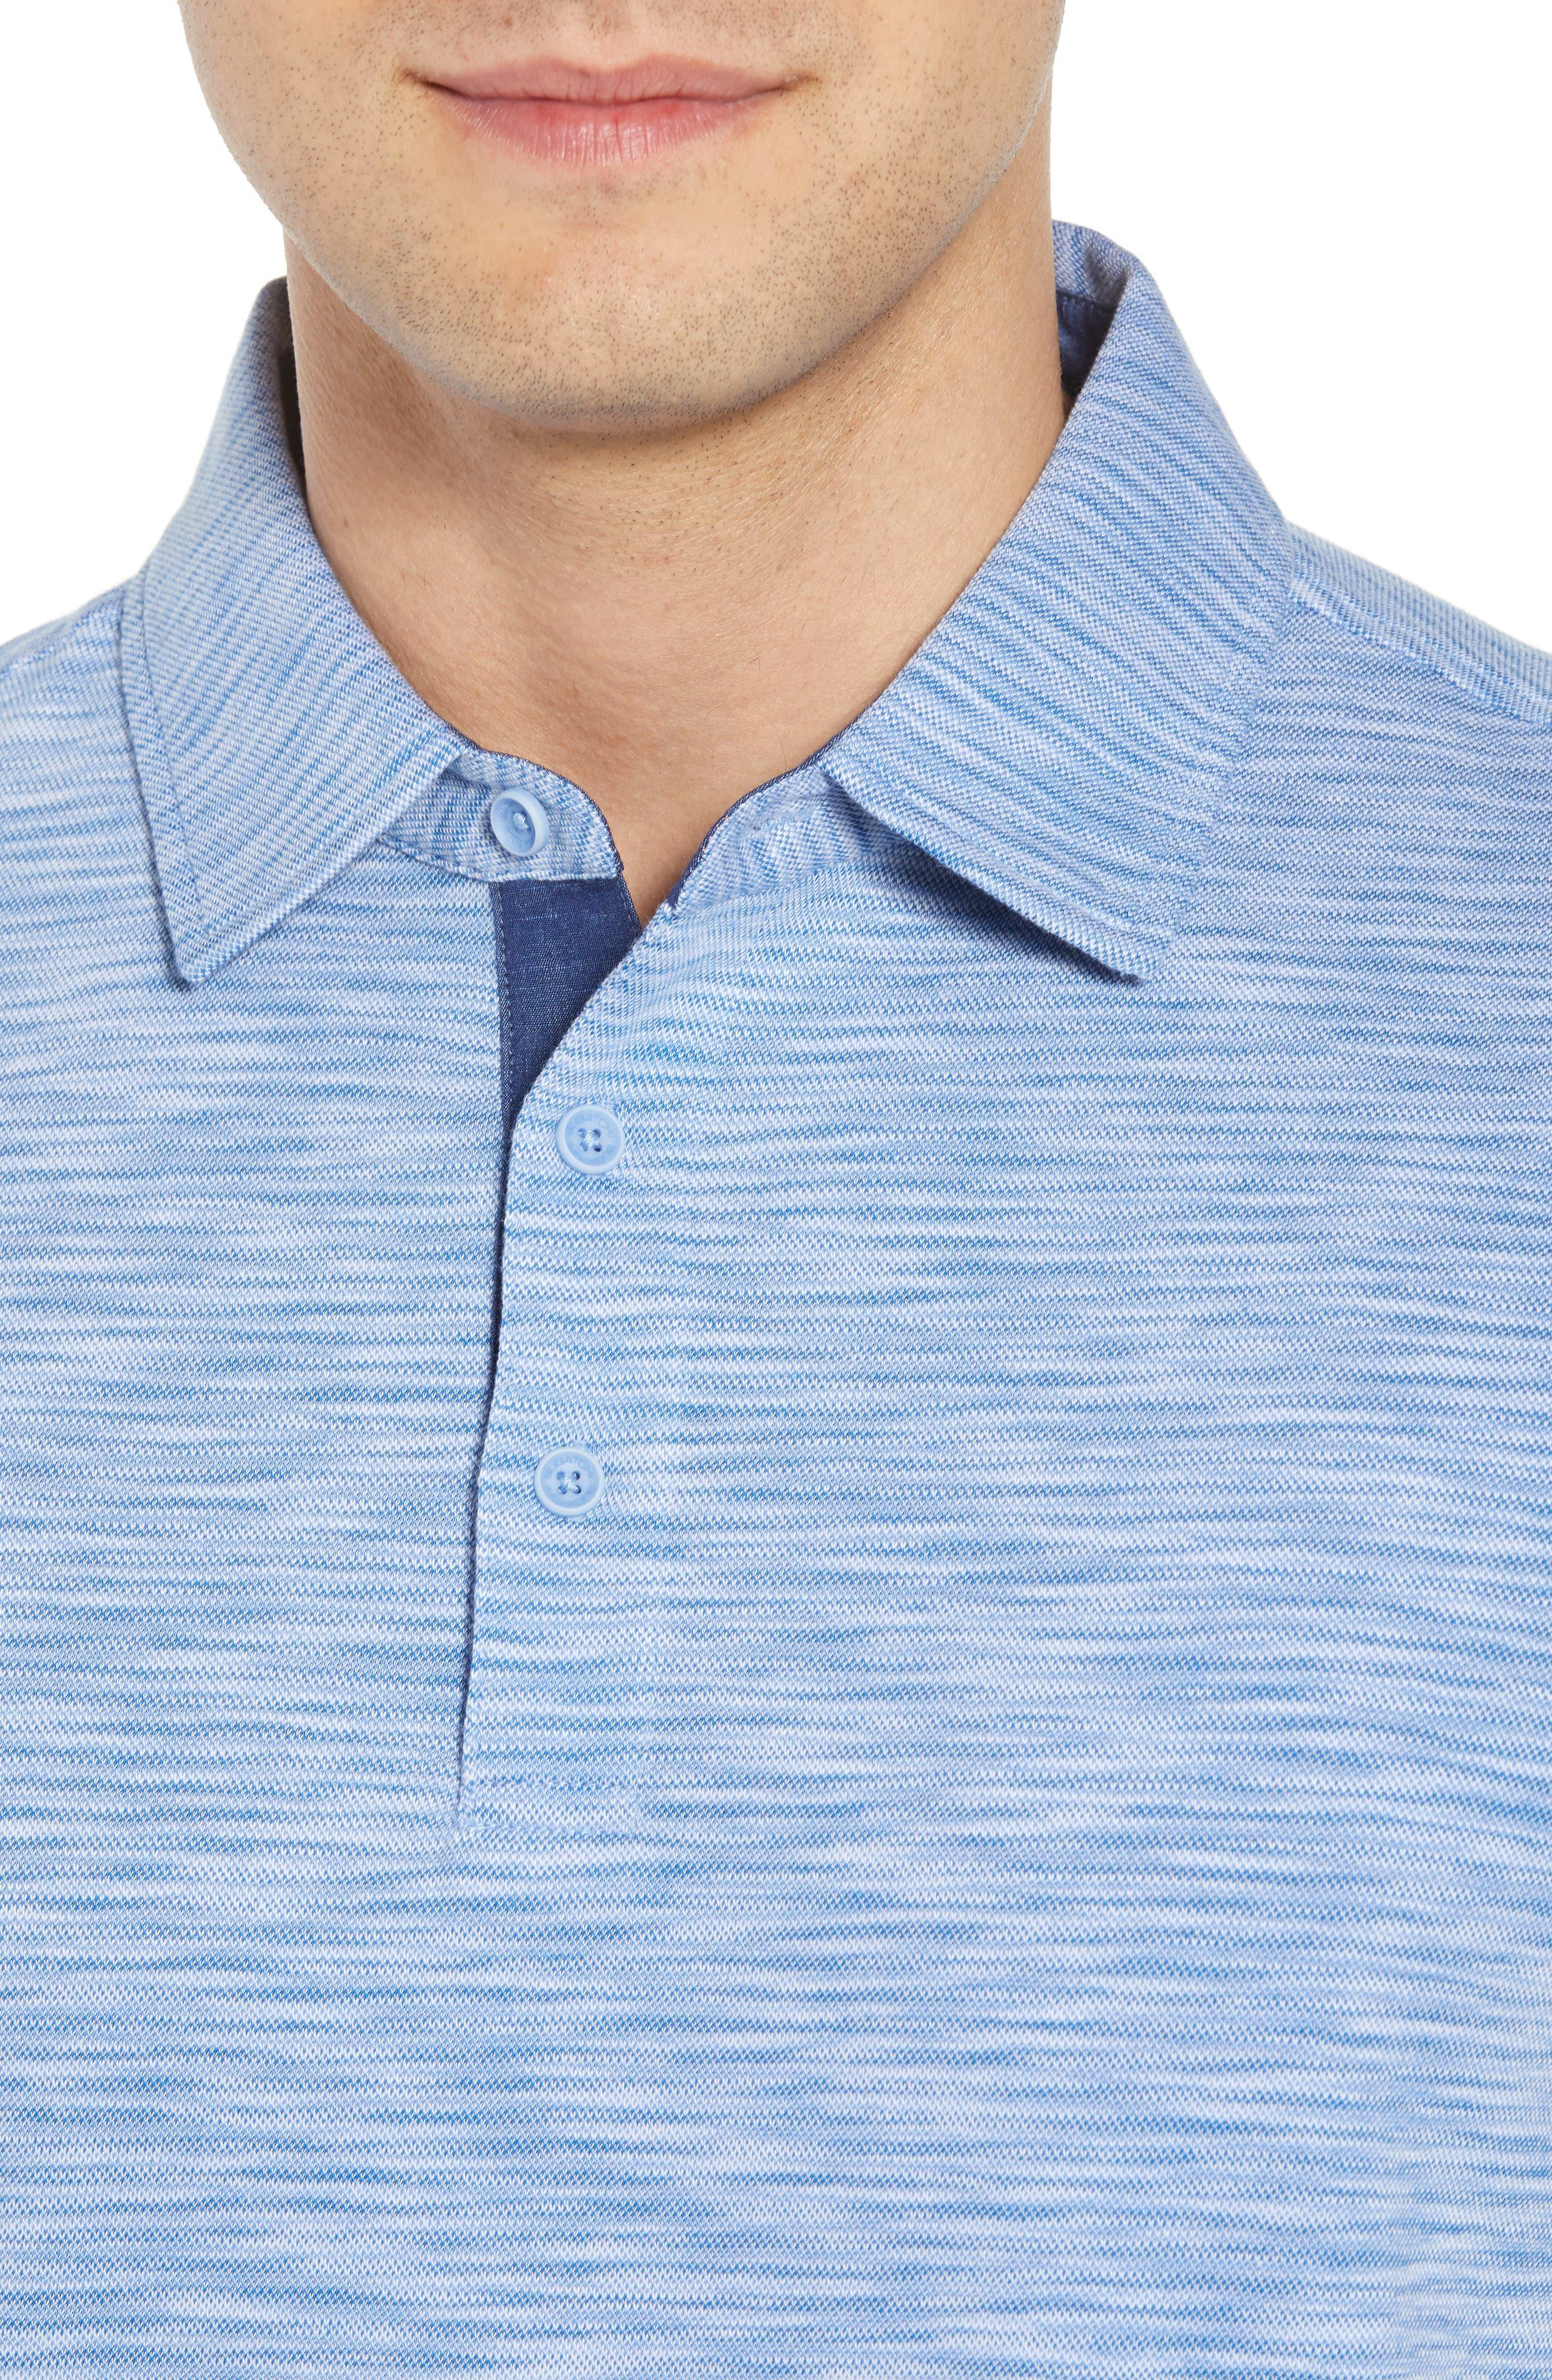 Marled Stripe Polo,                             Alternate thumbnail 4, color,                             CLASSIC BLUE